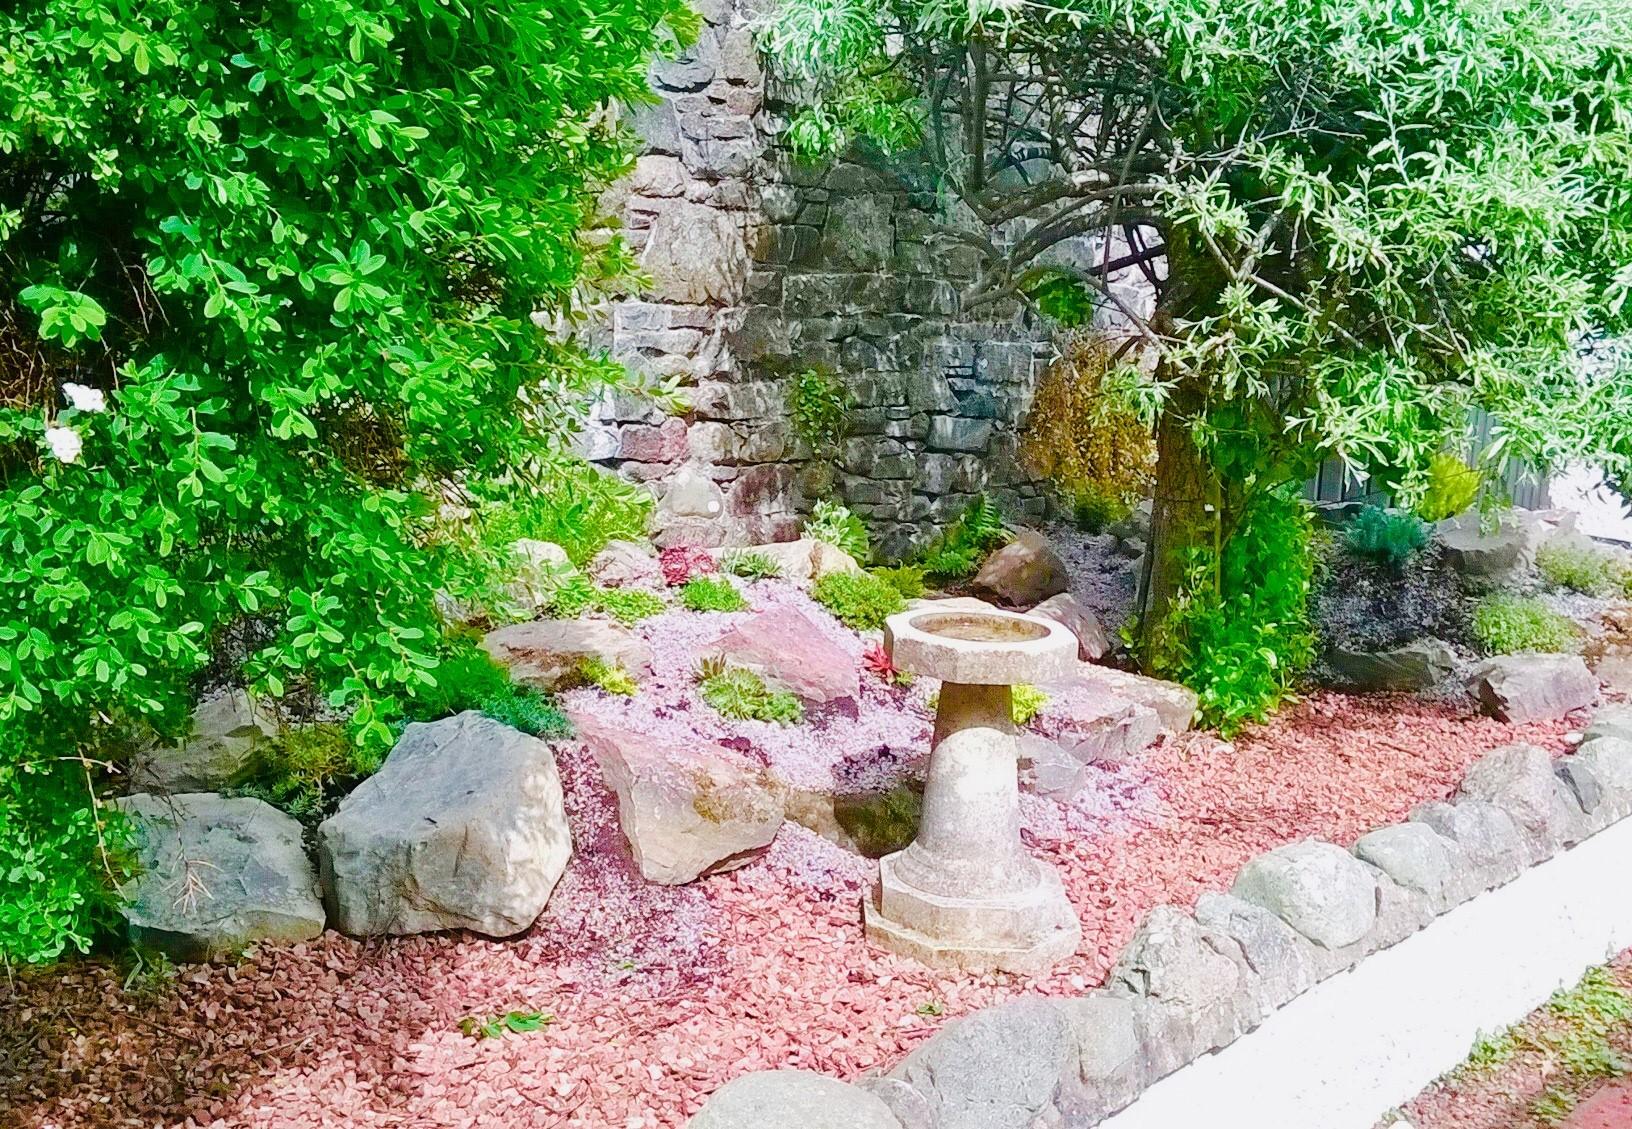 Antique Victorian stone bird baths in a happy customers traditional garden. Genuine reclaimed stone bird baths are perfect for traditional period gardens